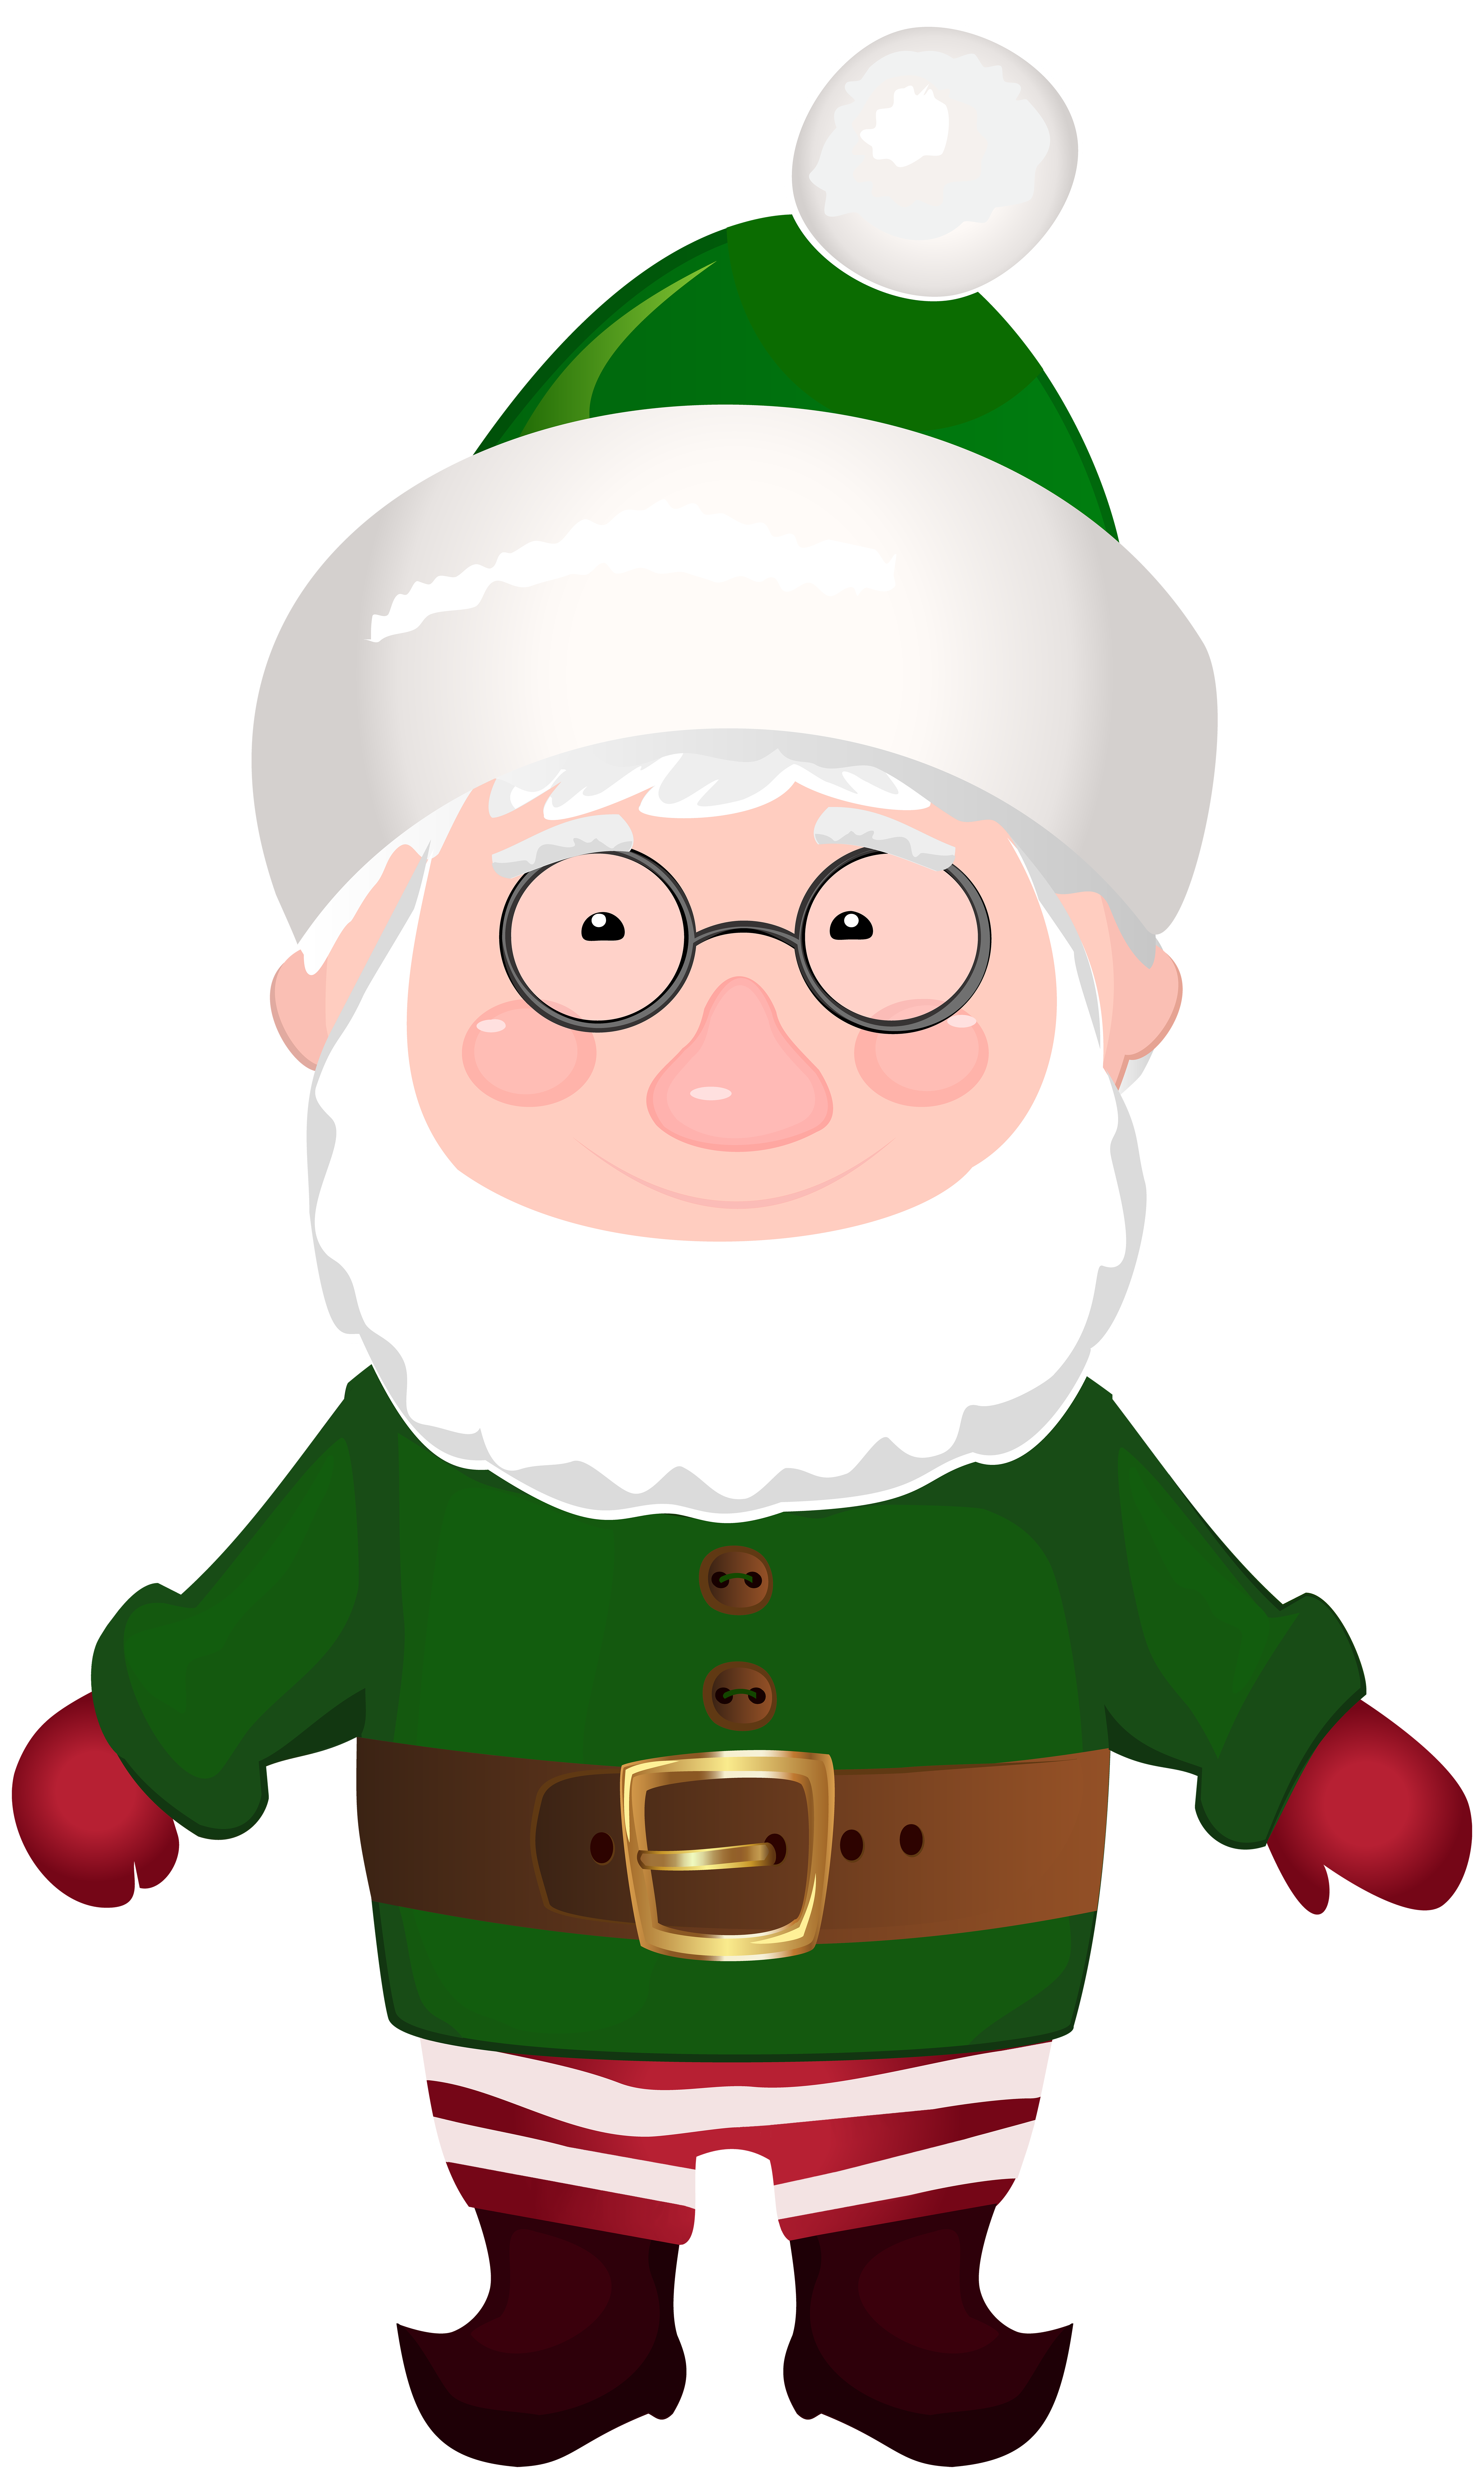 School helper clipart banner library stock Dwarf Santa Claus Helper Transparent PNG Clip Art Image | Gallery ... banner library stock